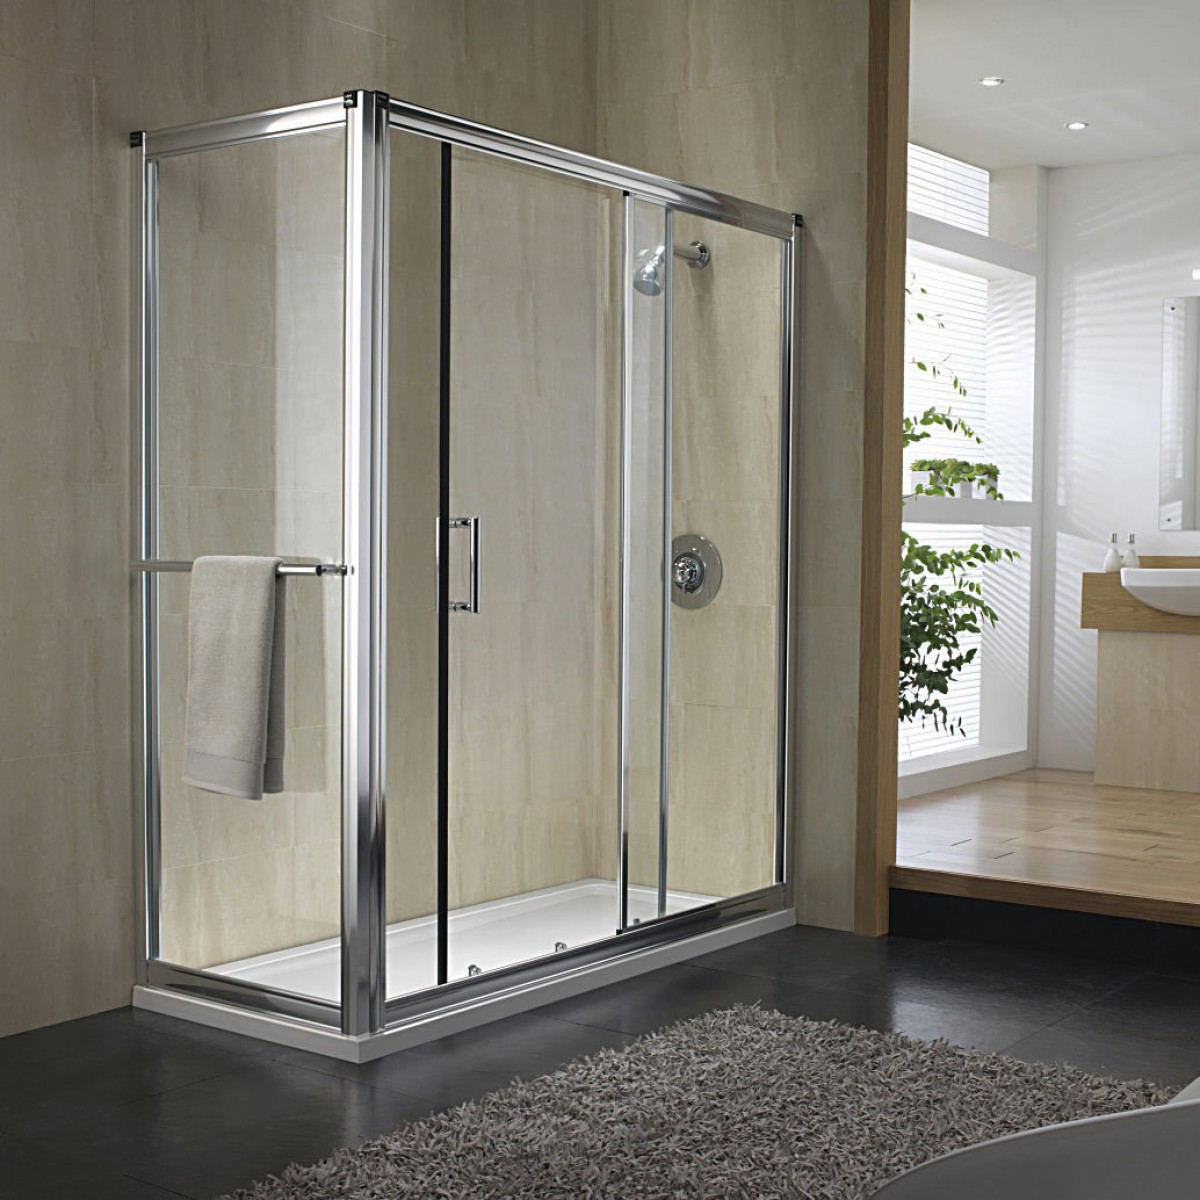 Twyford hydr8 1500mm sliding shower door h89501cp for 1500 sliding shower door